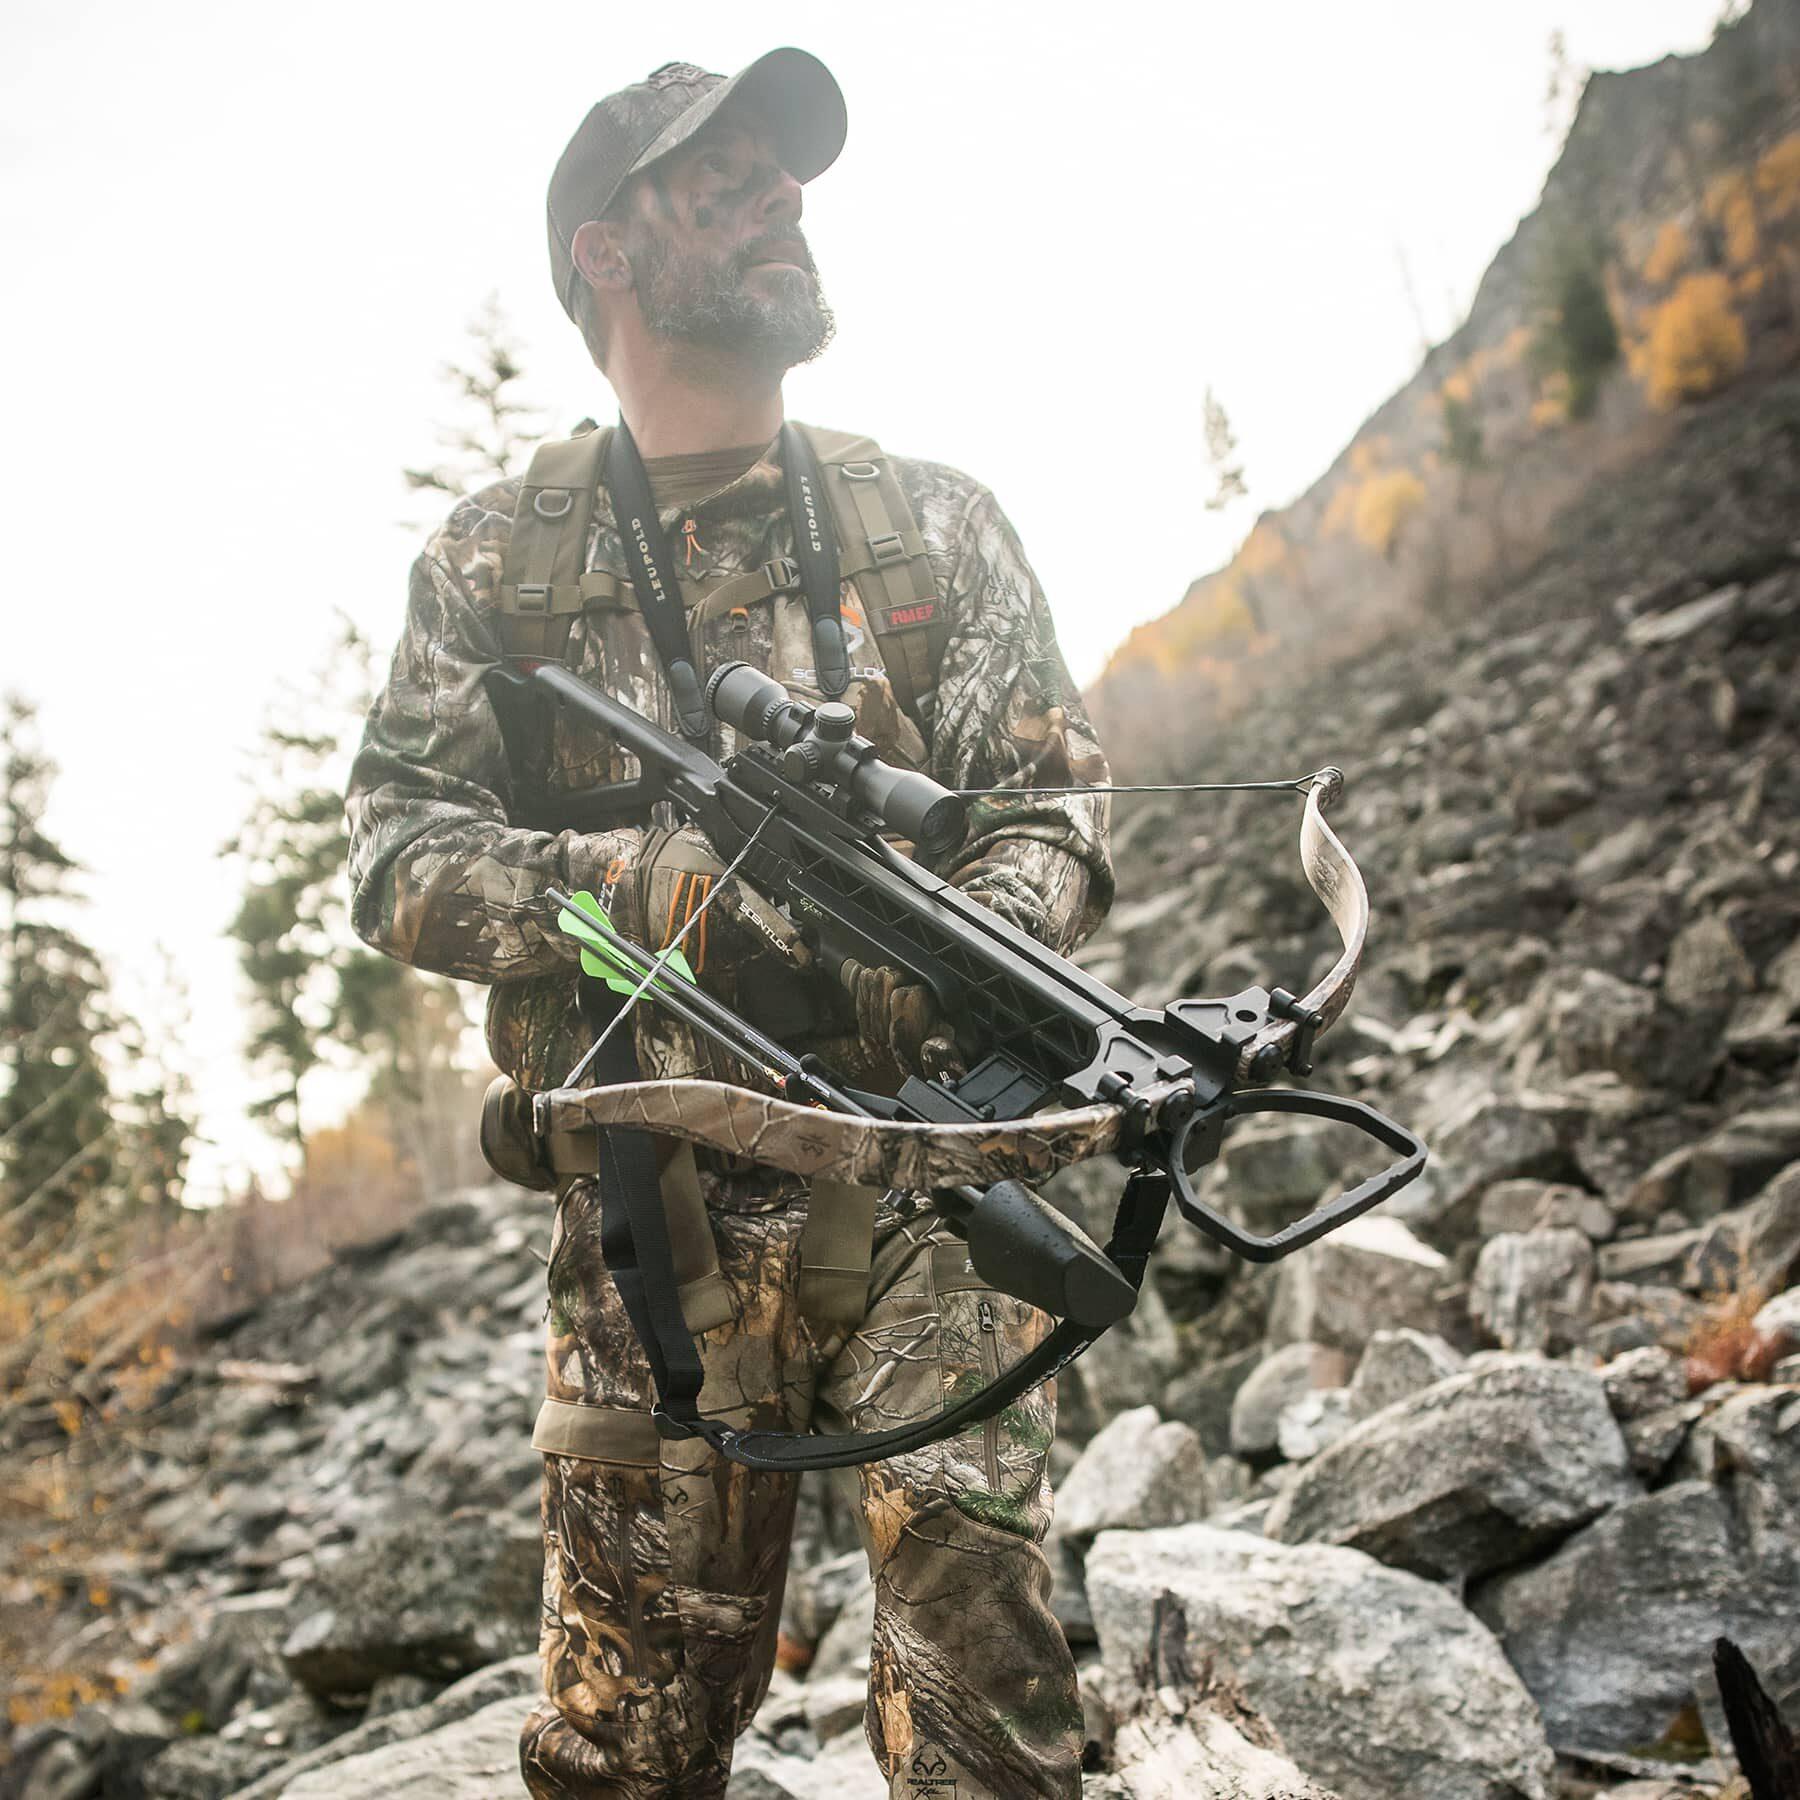 hunter holding the grz 2